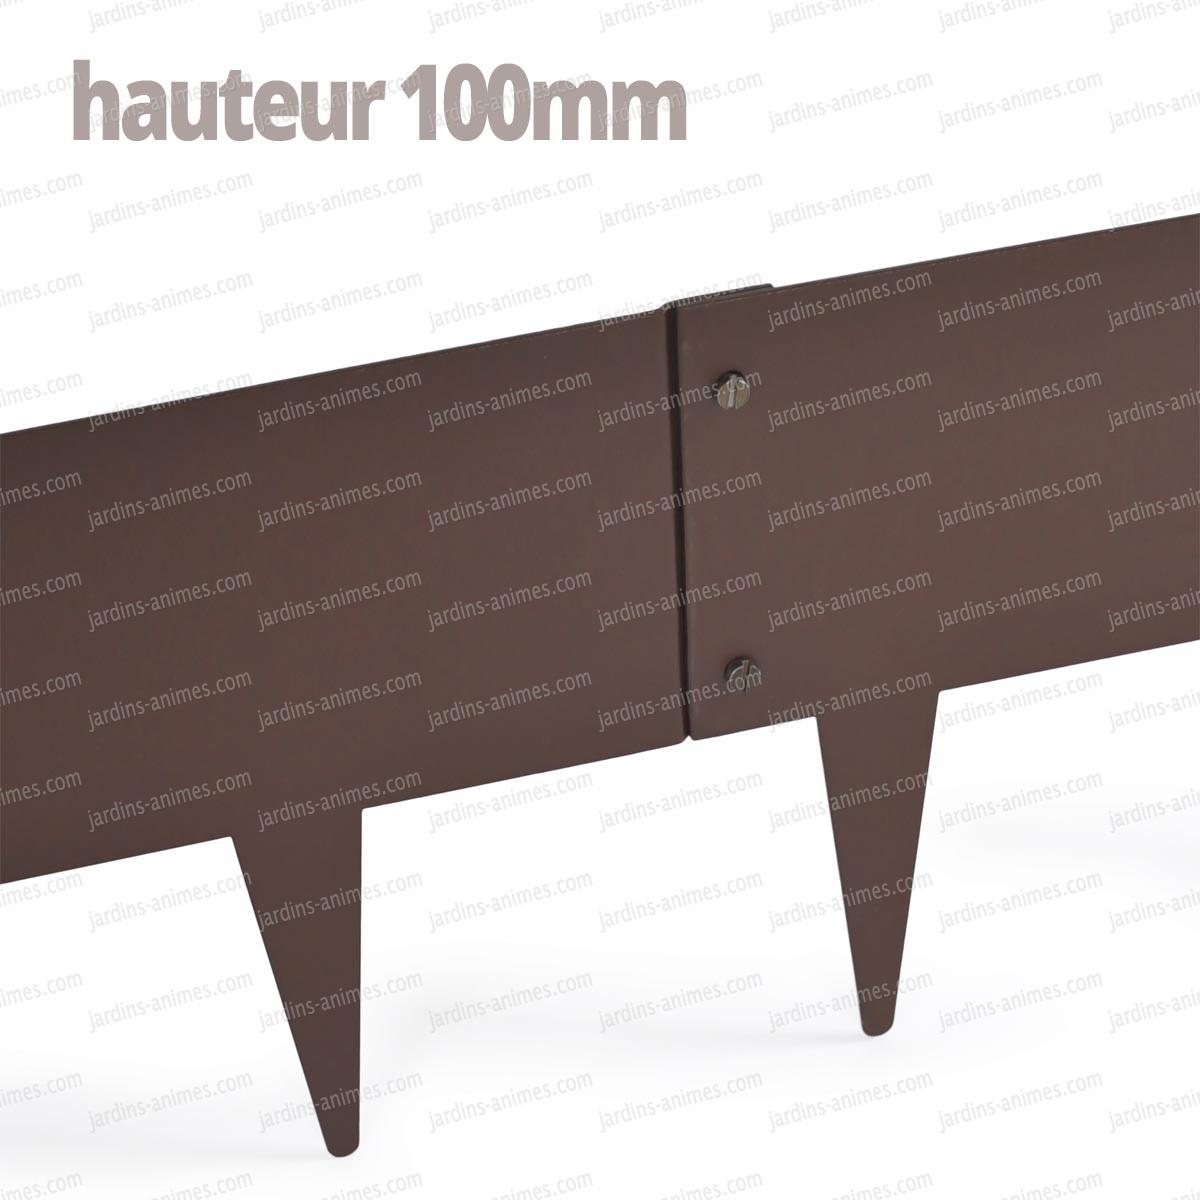 bordure gazon. Black Bedroom Furniture Sets. Home Design Ideas